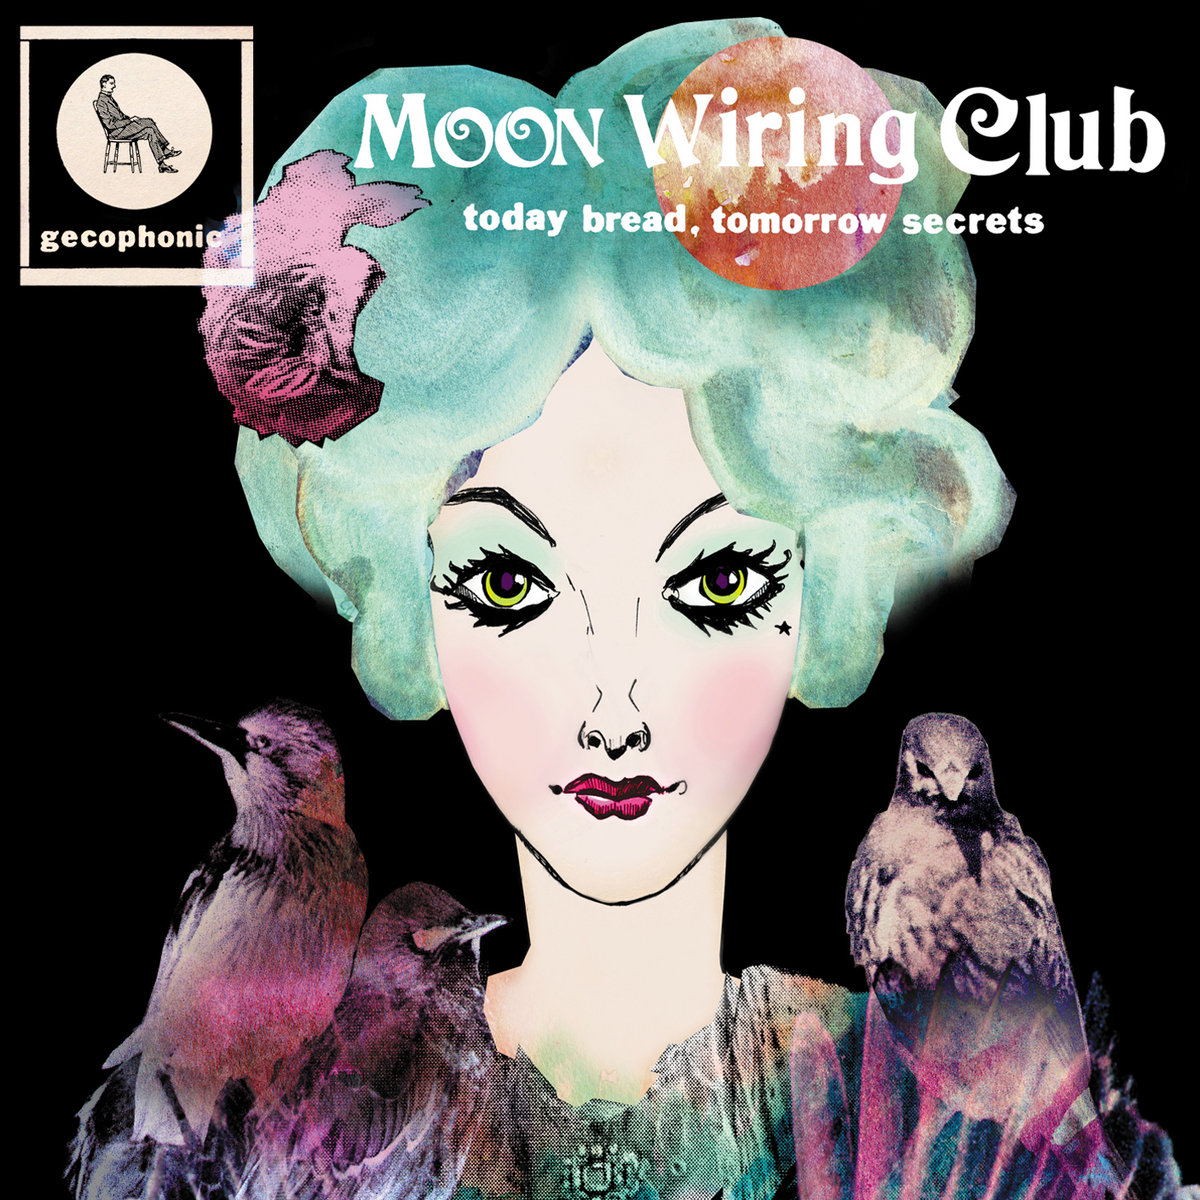 Moon Wiring Club's interview, best kept secret (part 1)